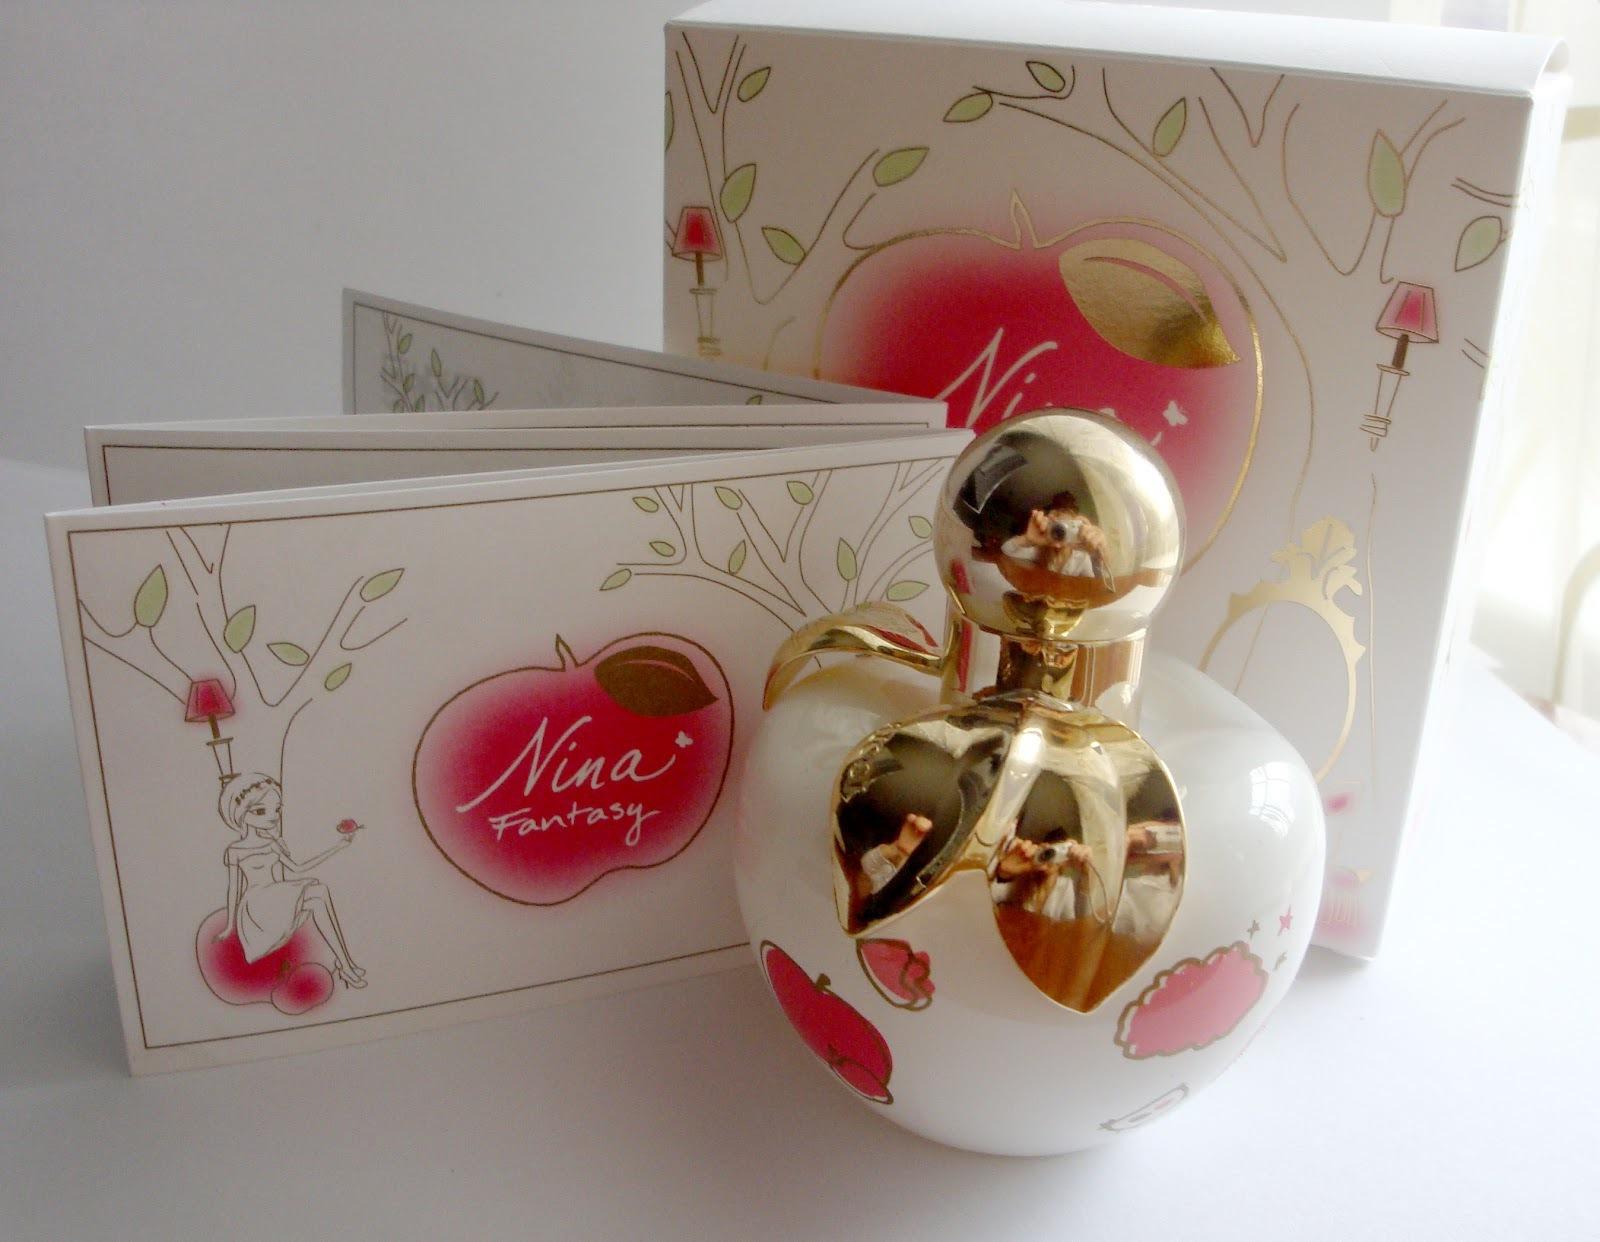 Nina Ricci Fantasy Eau De Toilette Spray Limited Edition for Women น้ำหอม Nina Ricci Fantasy ขวดรูปแอ๊ปเปิ้ลสีขาวลายน้องกวางน้อยน่ารักมาก จุกสีทอง ขนาดจริง ปริมาณ 80 ml. หอมหวาน แนวน่ารัก มีสเน่ห์ ตัวนี้ เป็นสินค้า Limited ออกครั้งเดียว และ ไม่มีมาวางจำหน